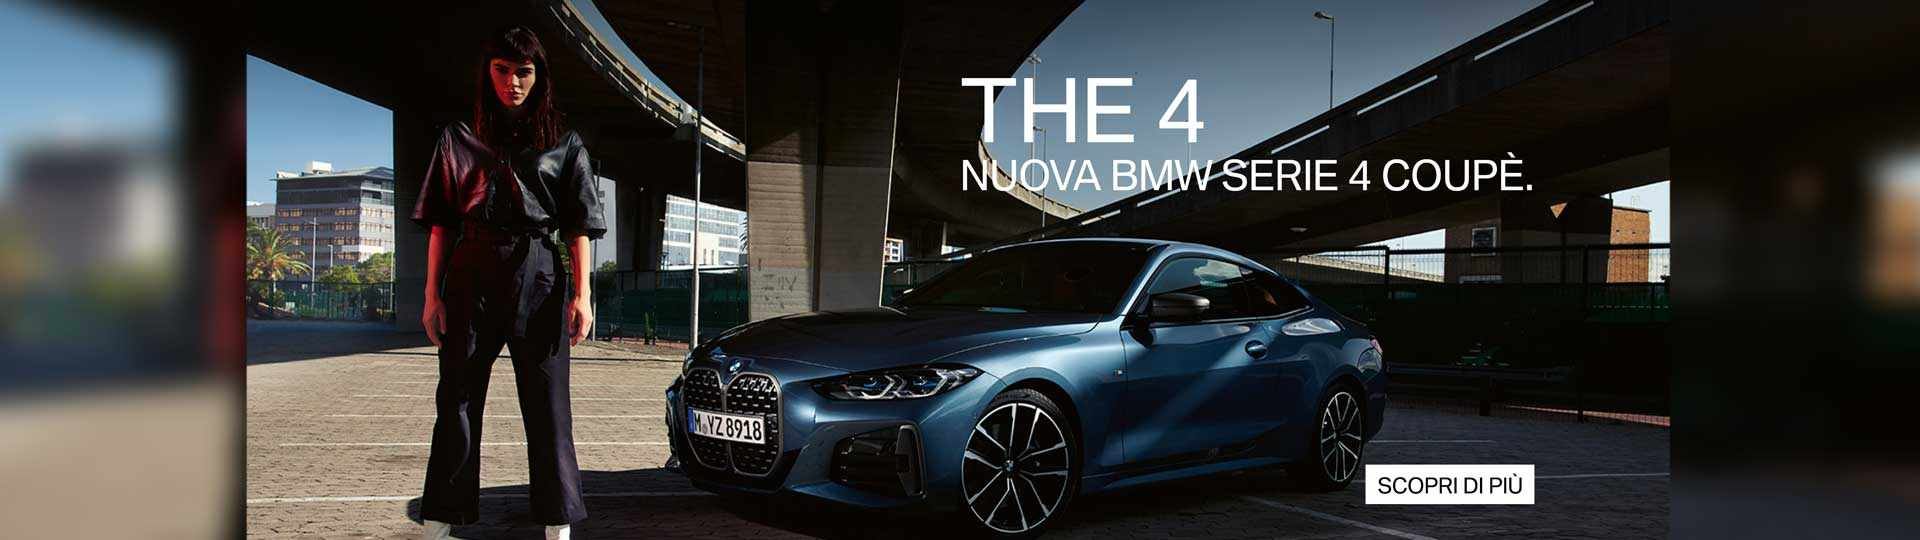 BMW-Serie-4-coupe-min.jpg